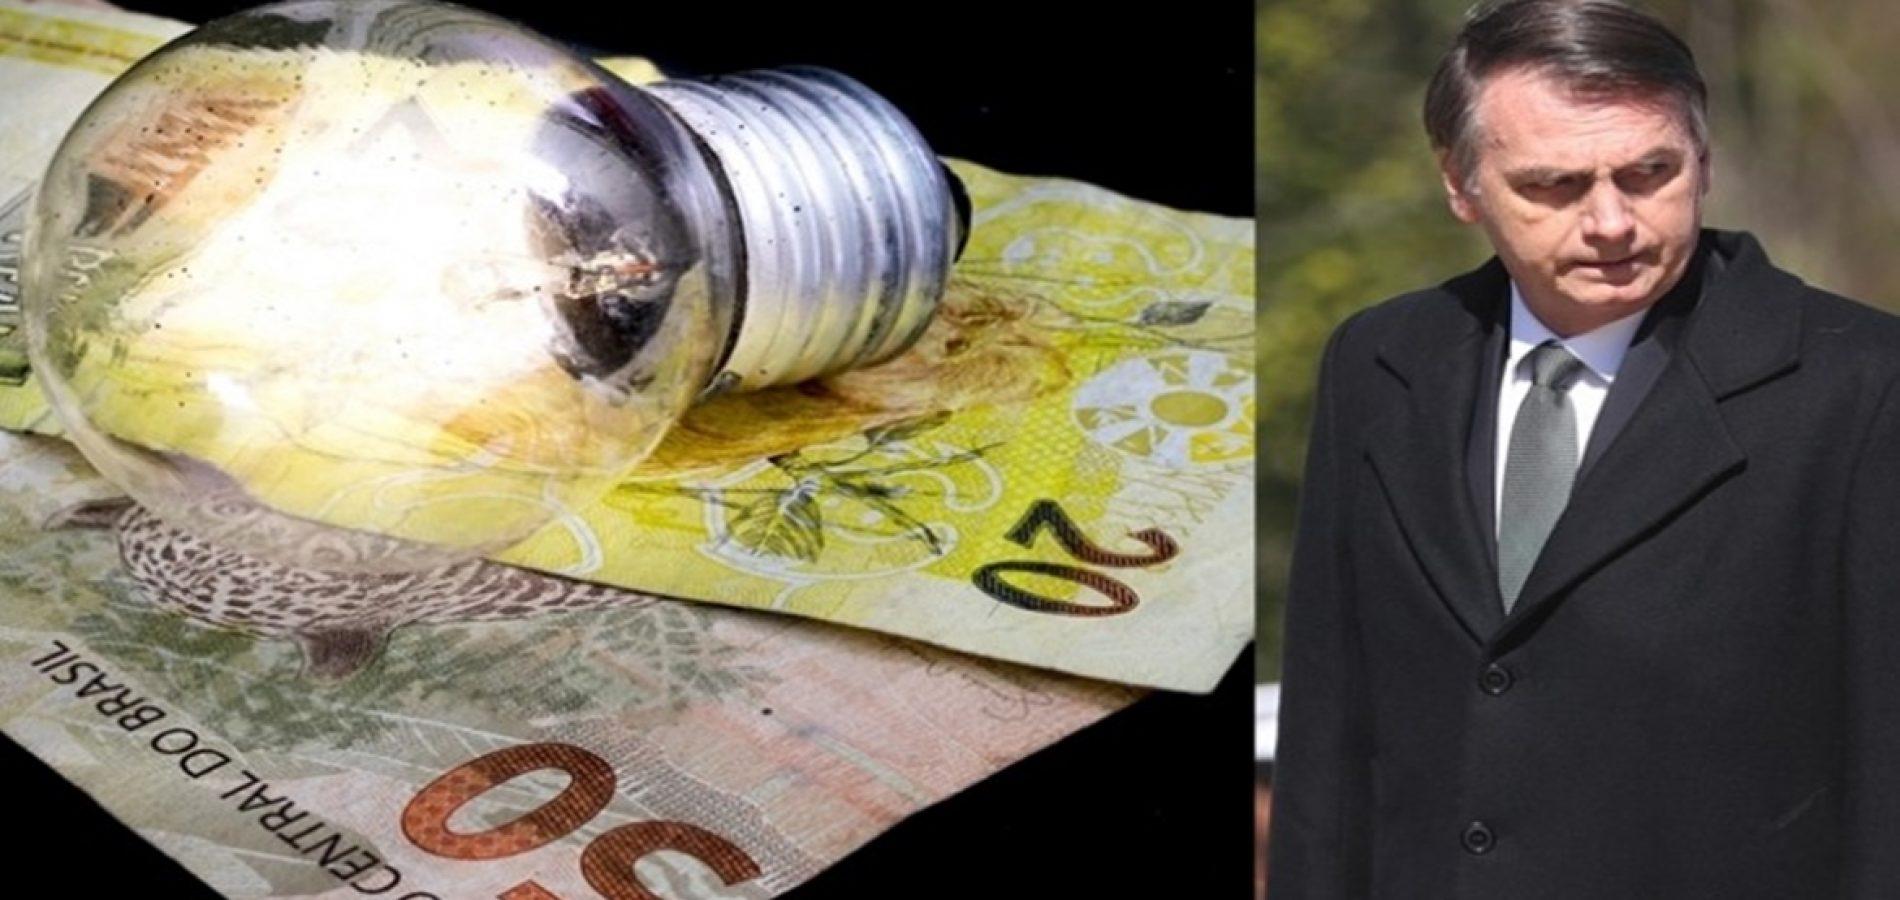 Conta de luz terá redução histórica após Bolsonaro pagar dívida do governo Dilma